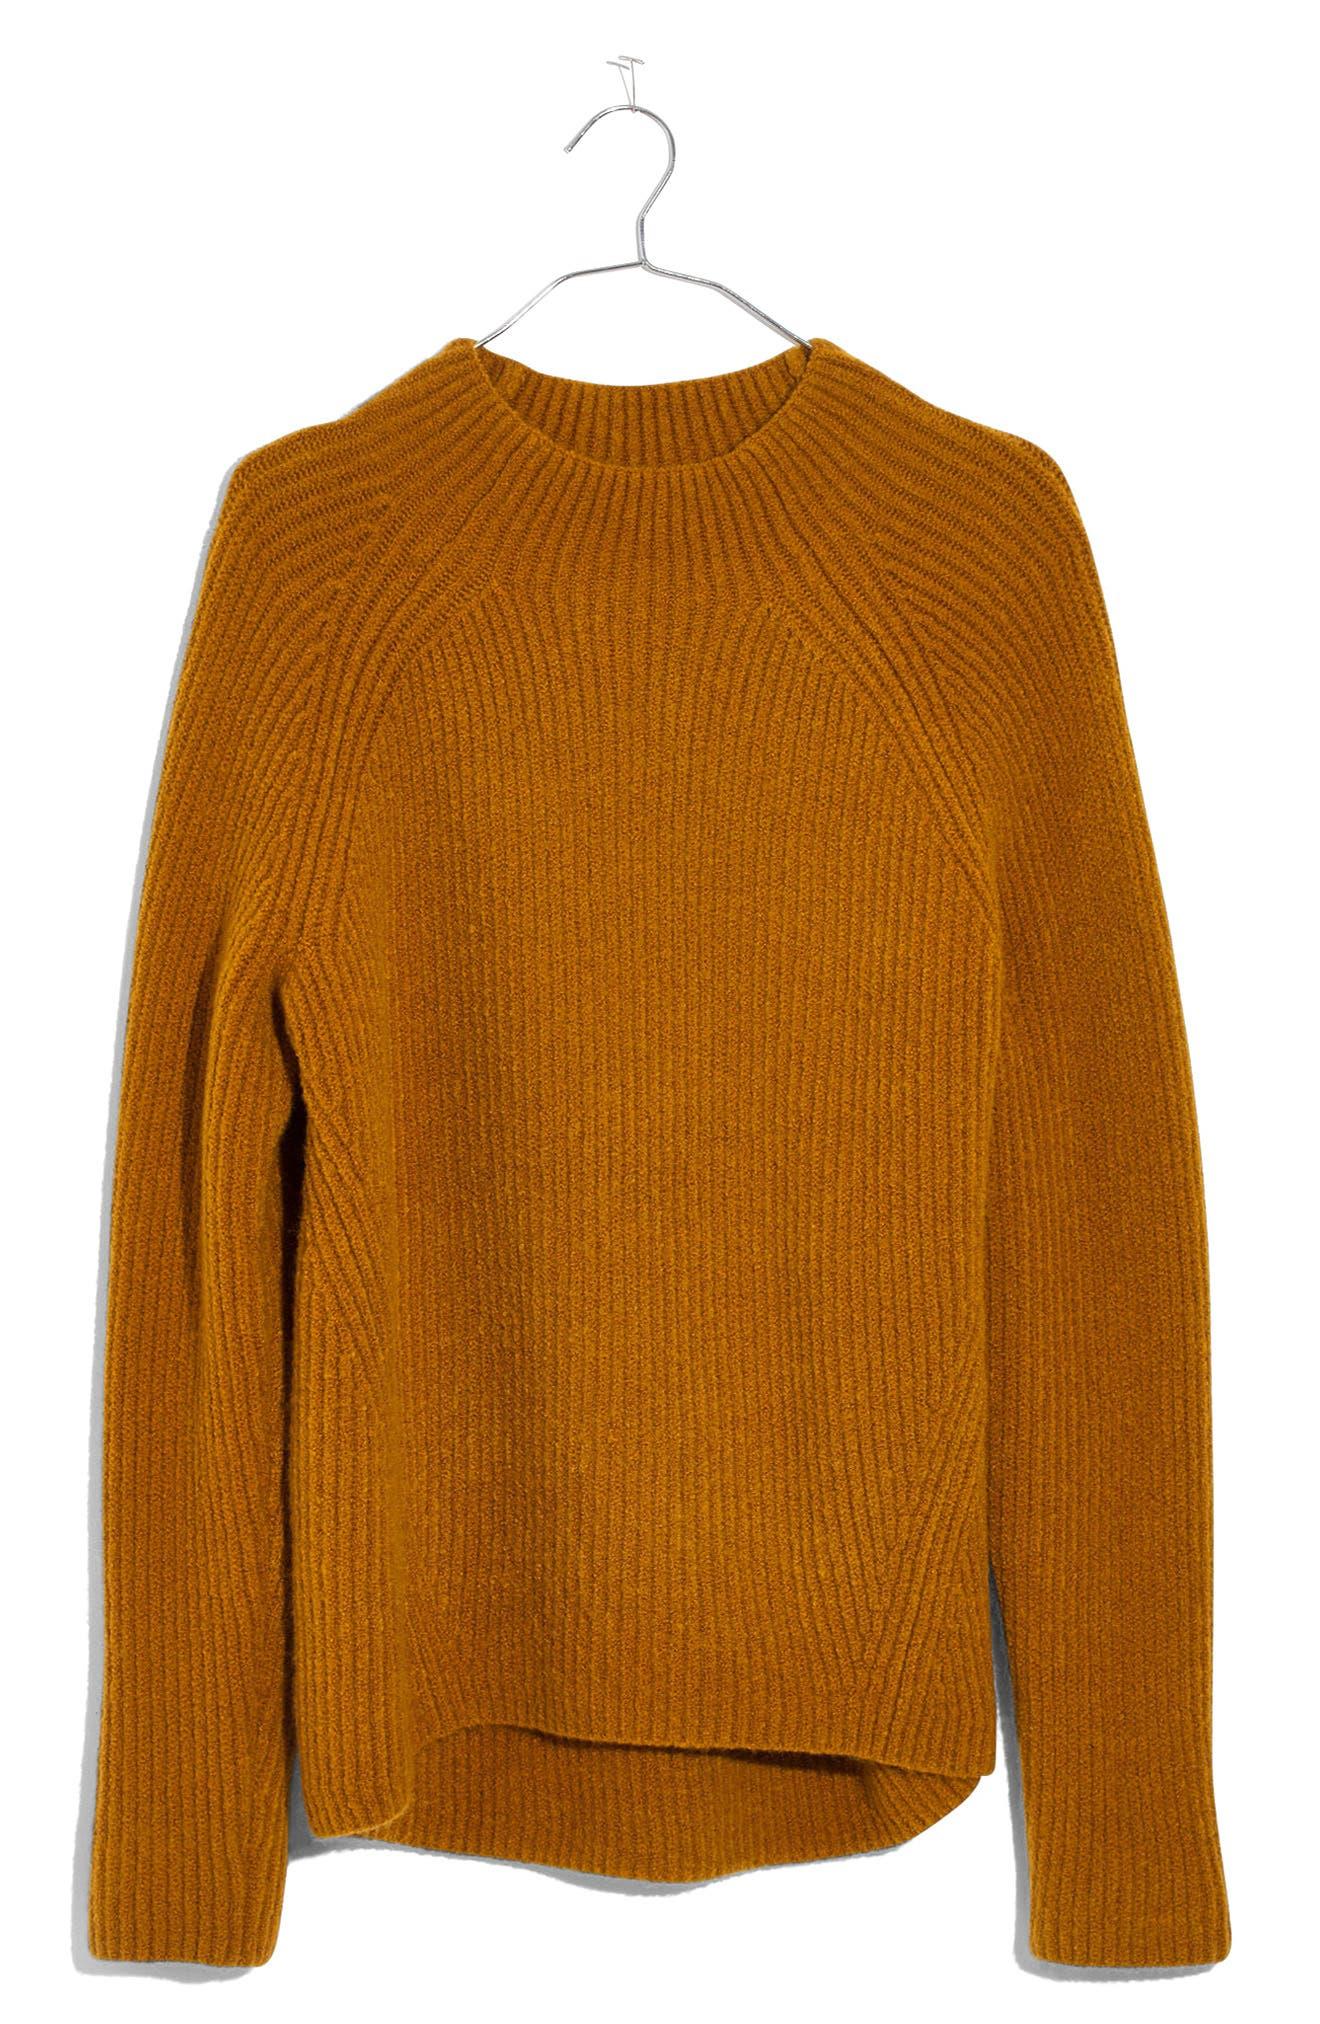 MADEWELL, Northfield Mock Neck Sweater, Alternate thumbnail 4, color, 800